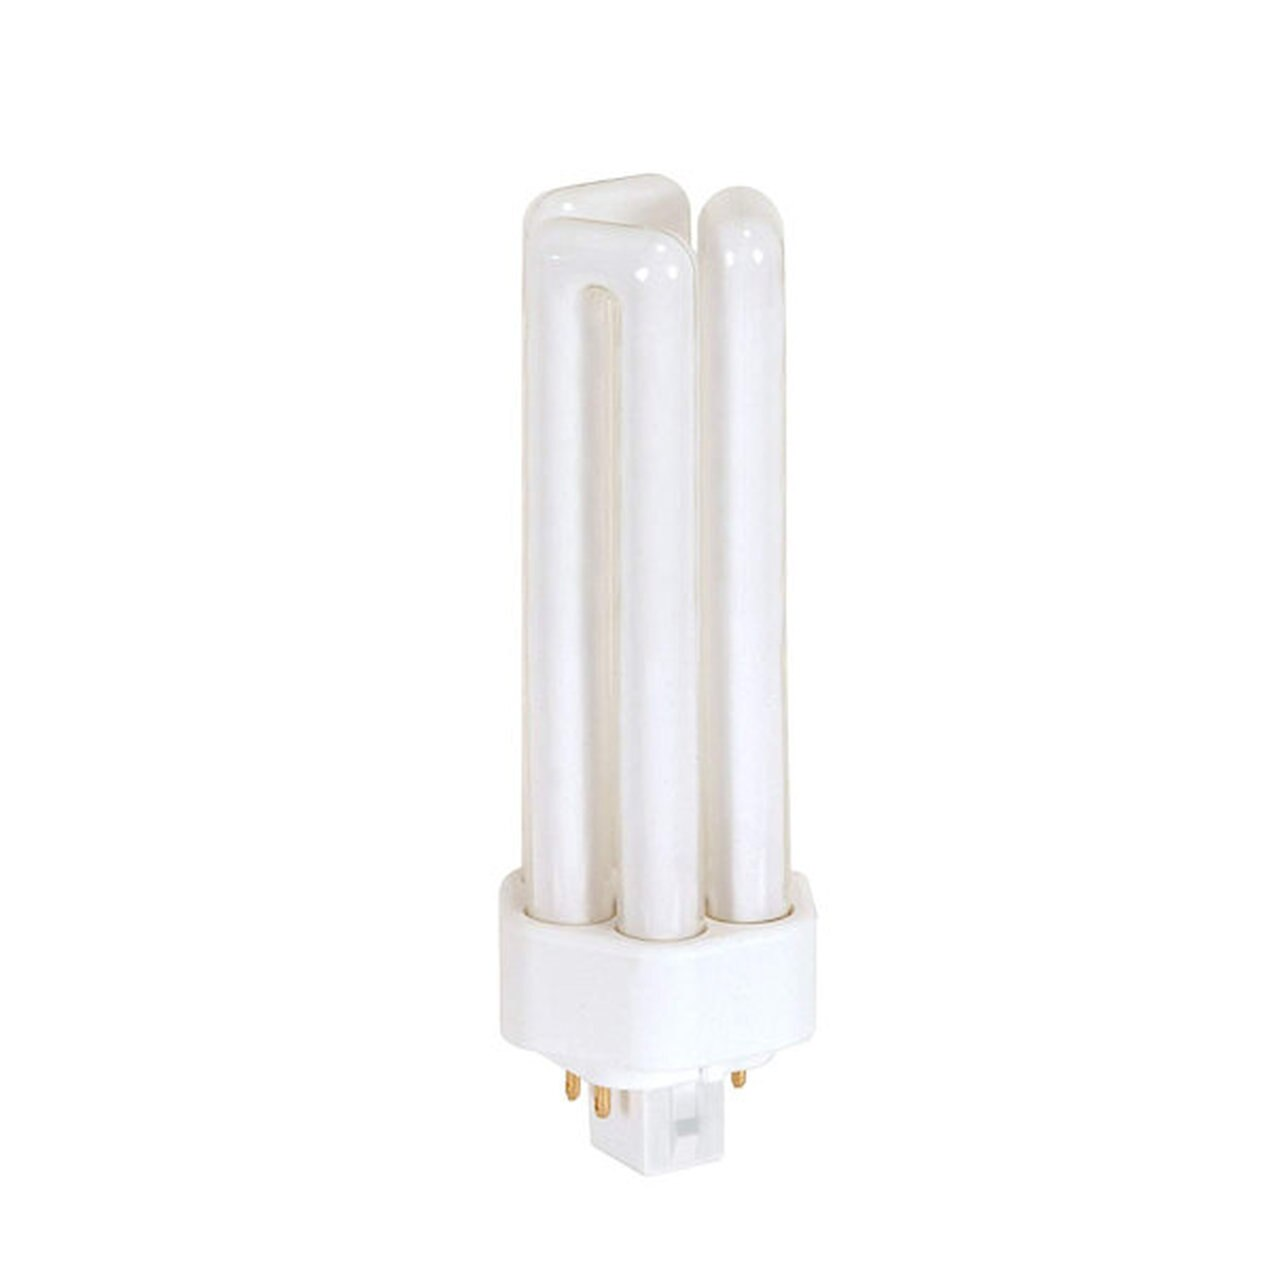 Bulbrite CF42T830//E 42W Triple 4-PIN 830K Compact Fluorescent Light Bulb Soft White